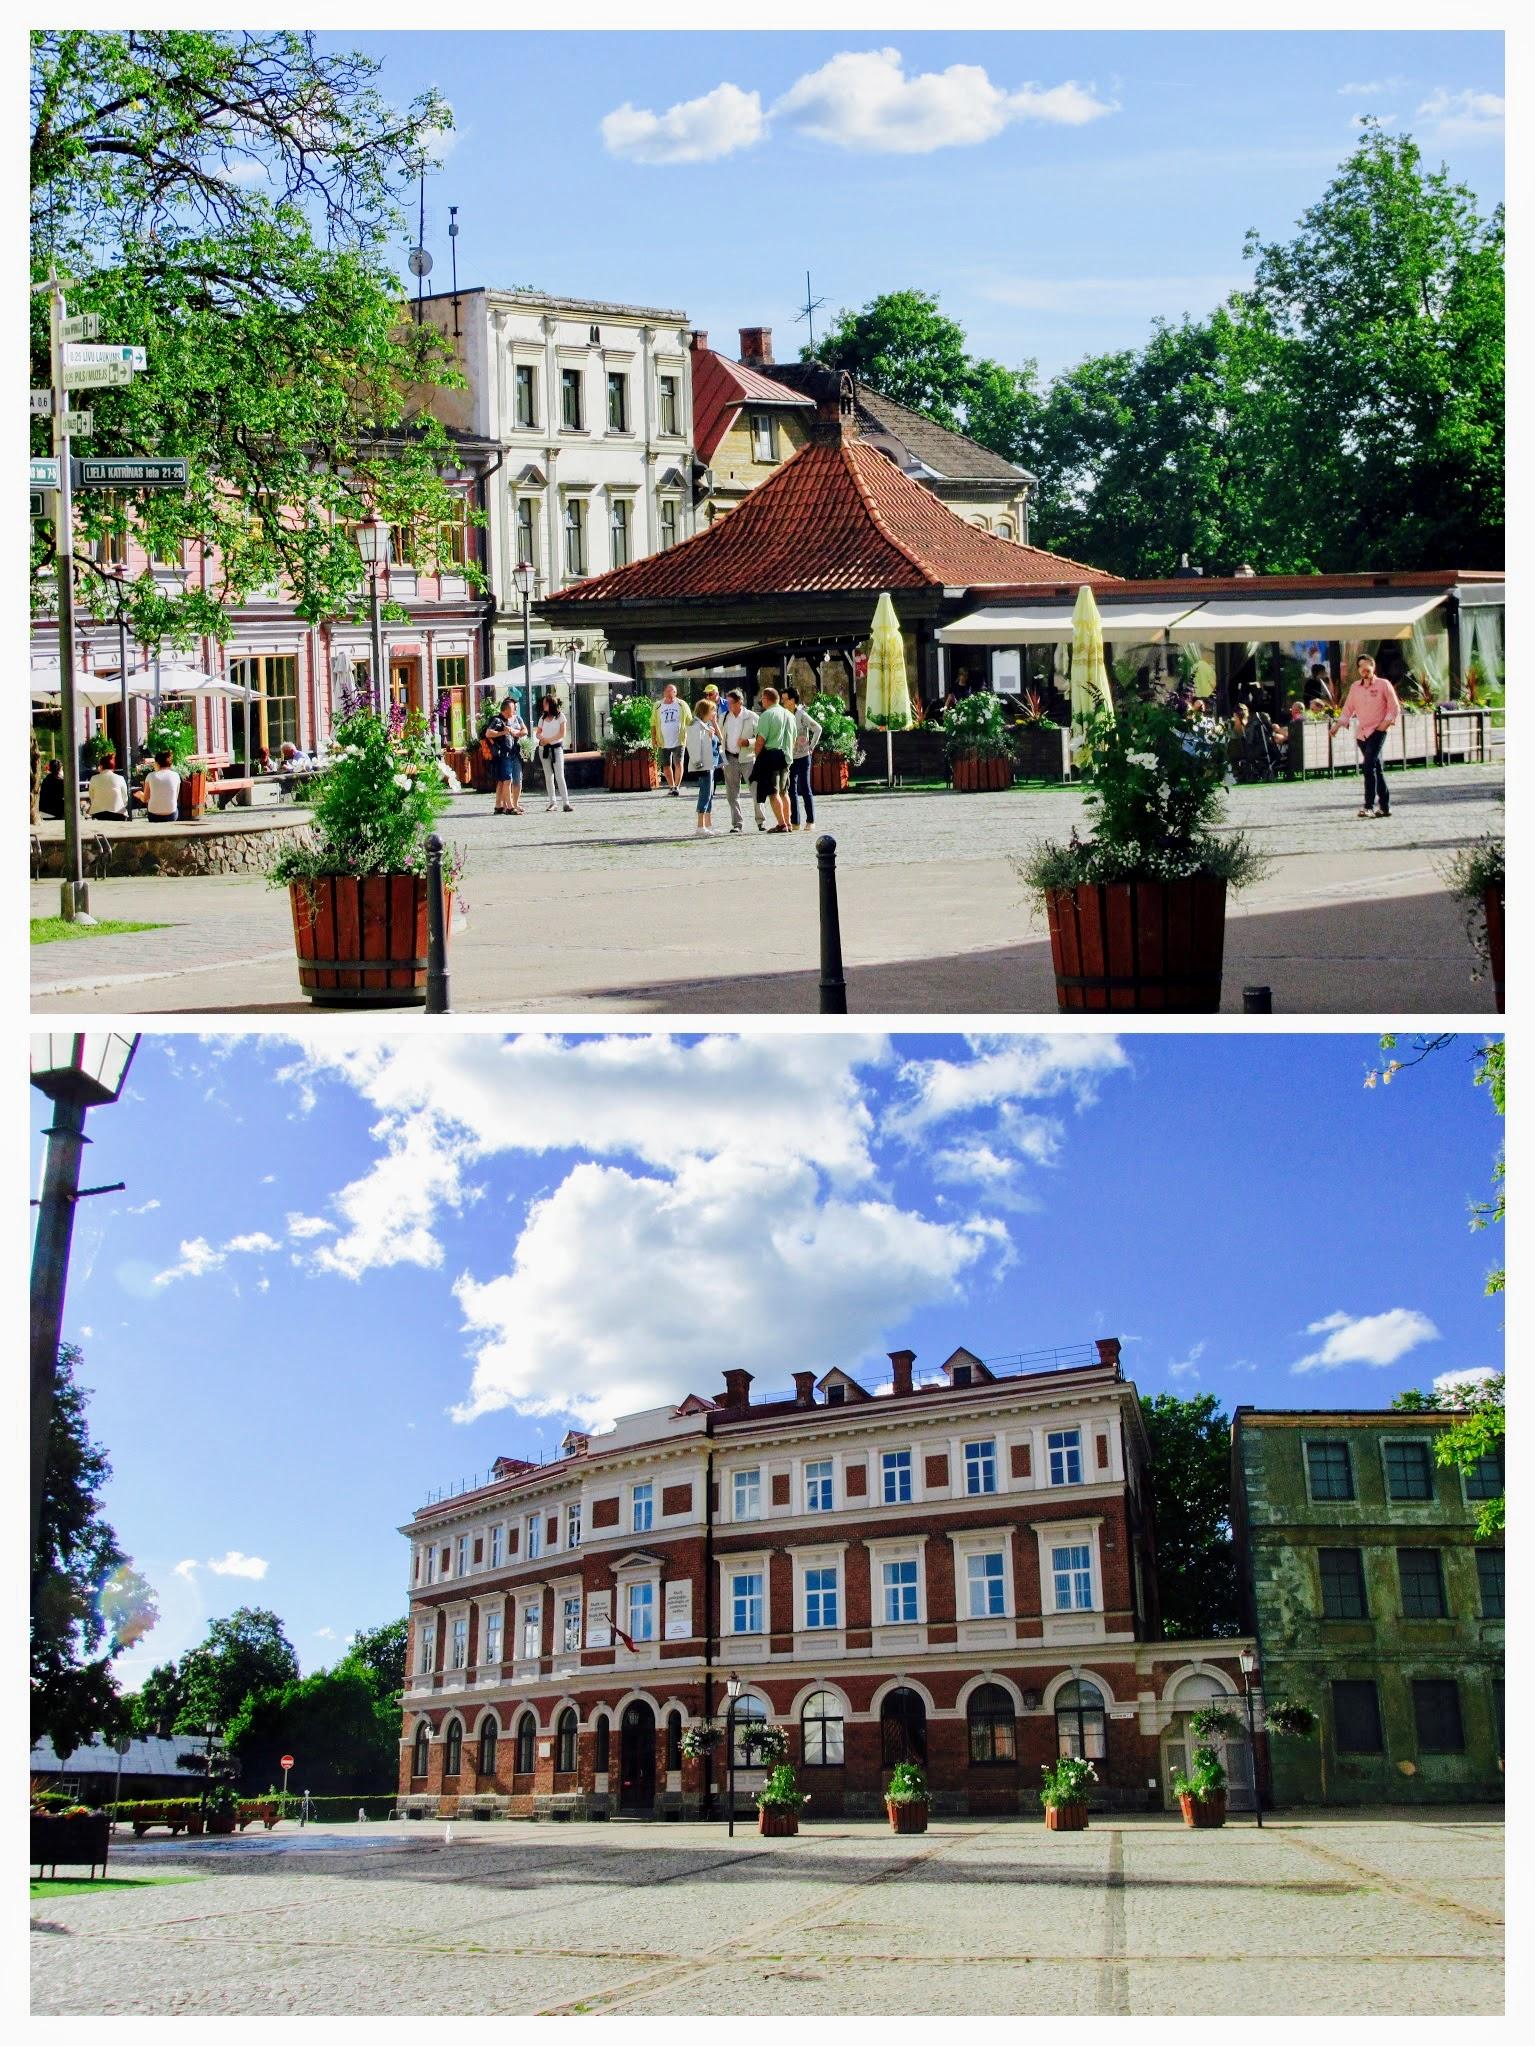 City square of Cesis.